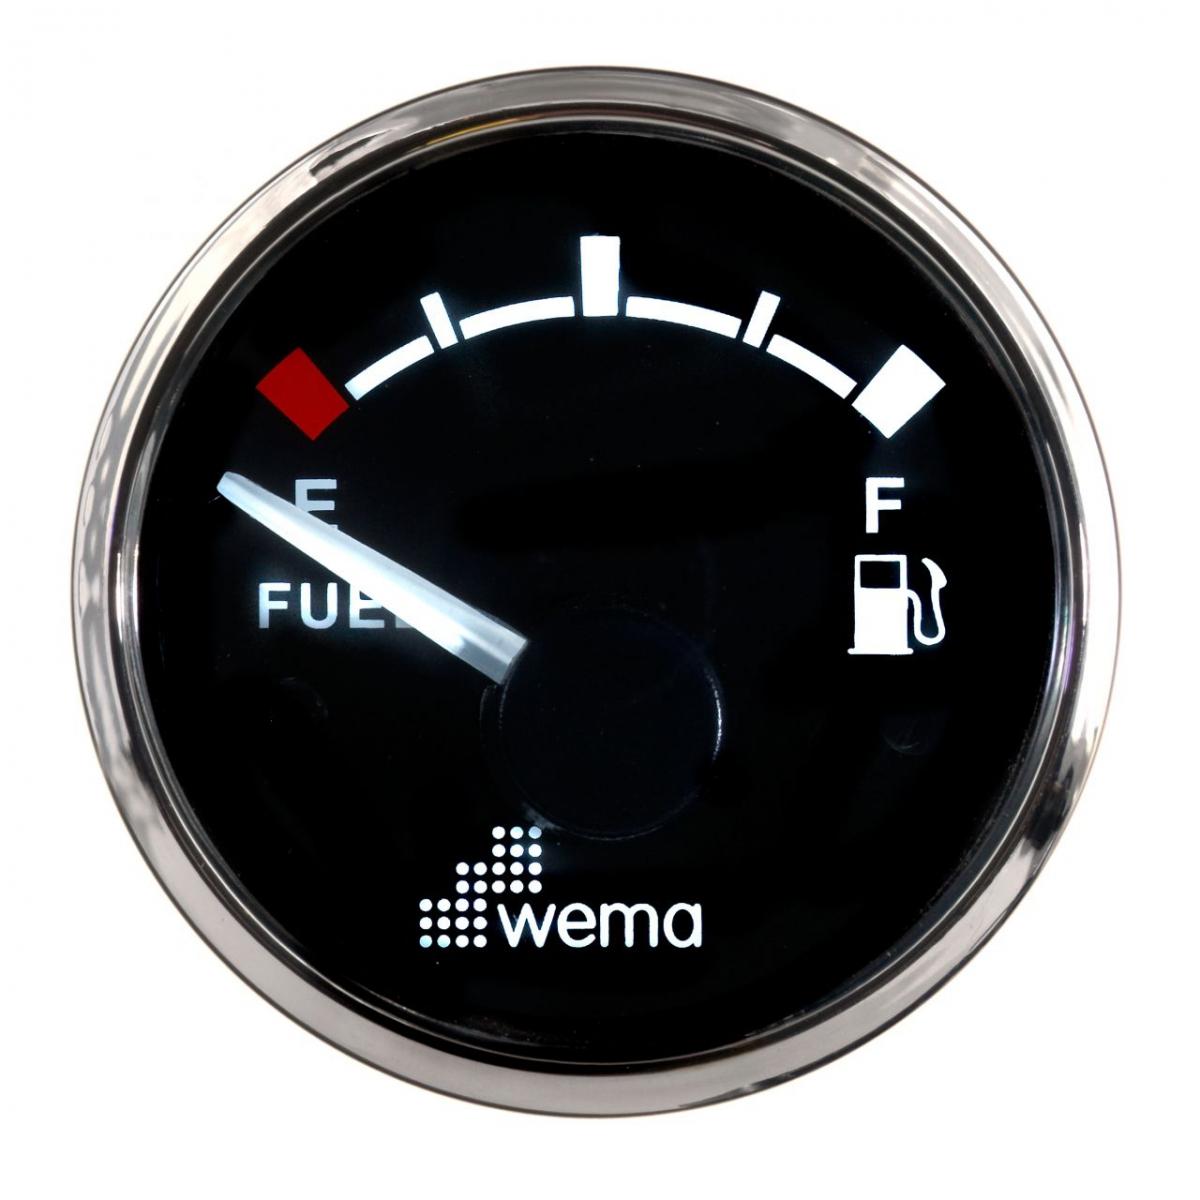 Wema IPFR Yakıt Tankı Seviye Göstergesi - Krom